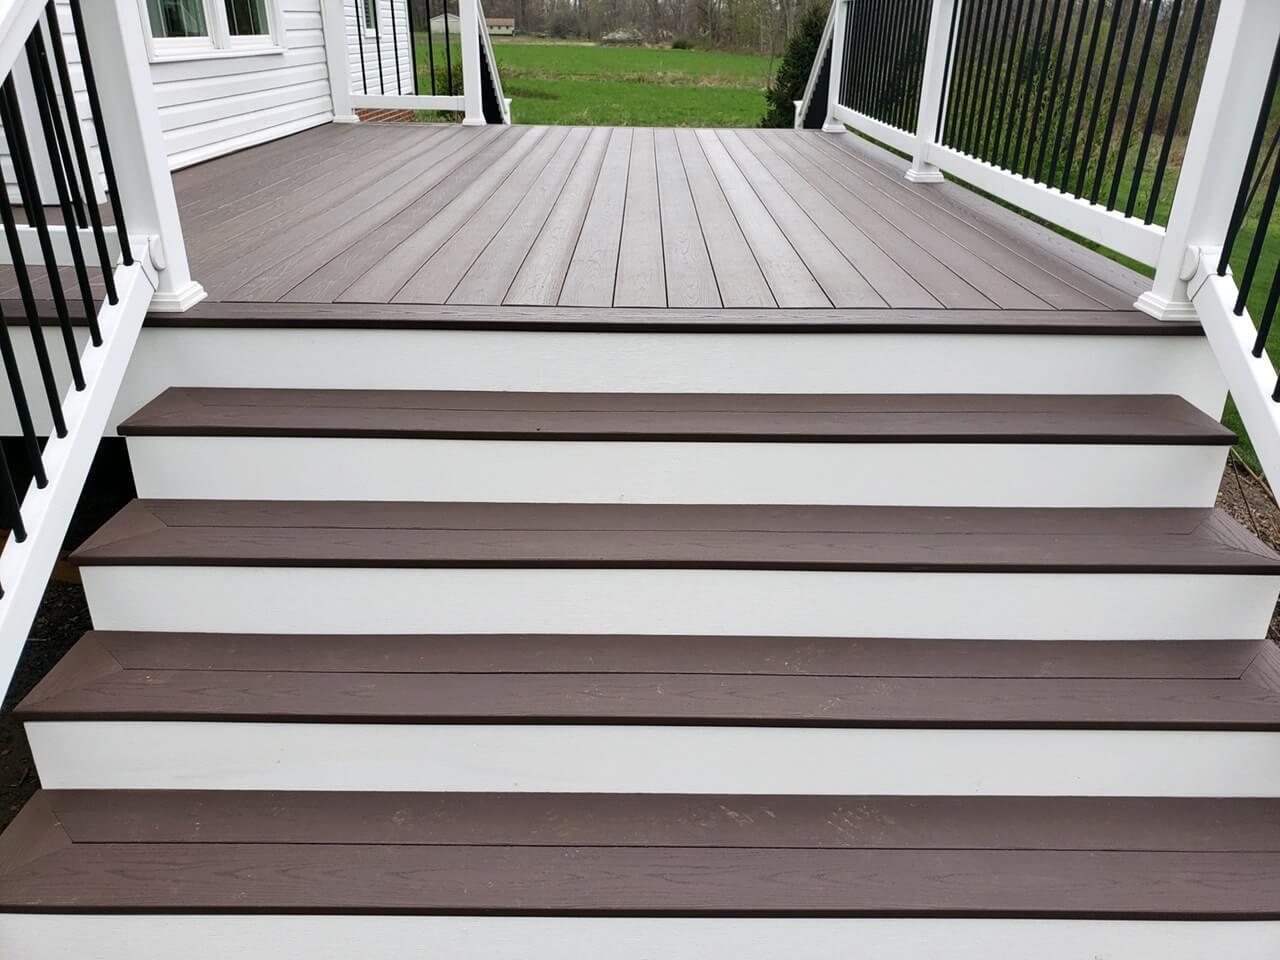 Backyard deck stairs